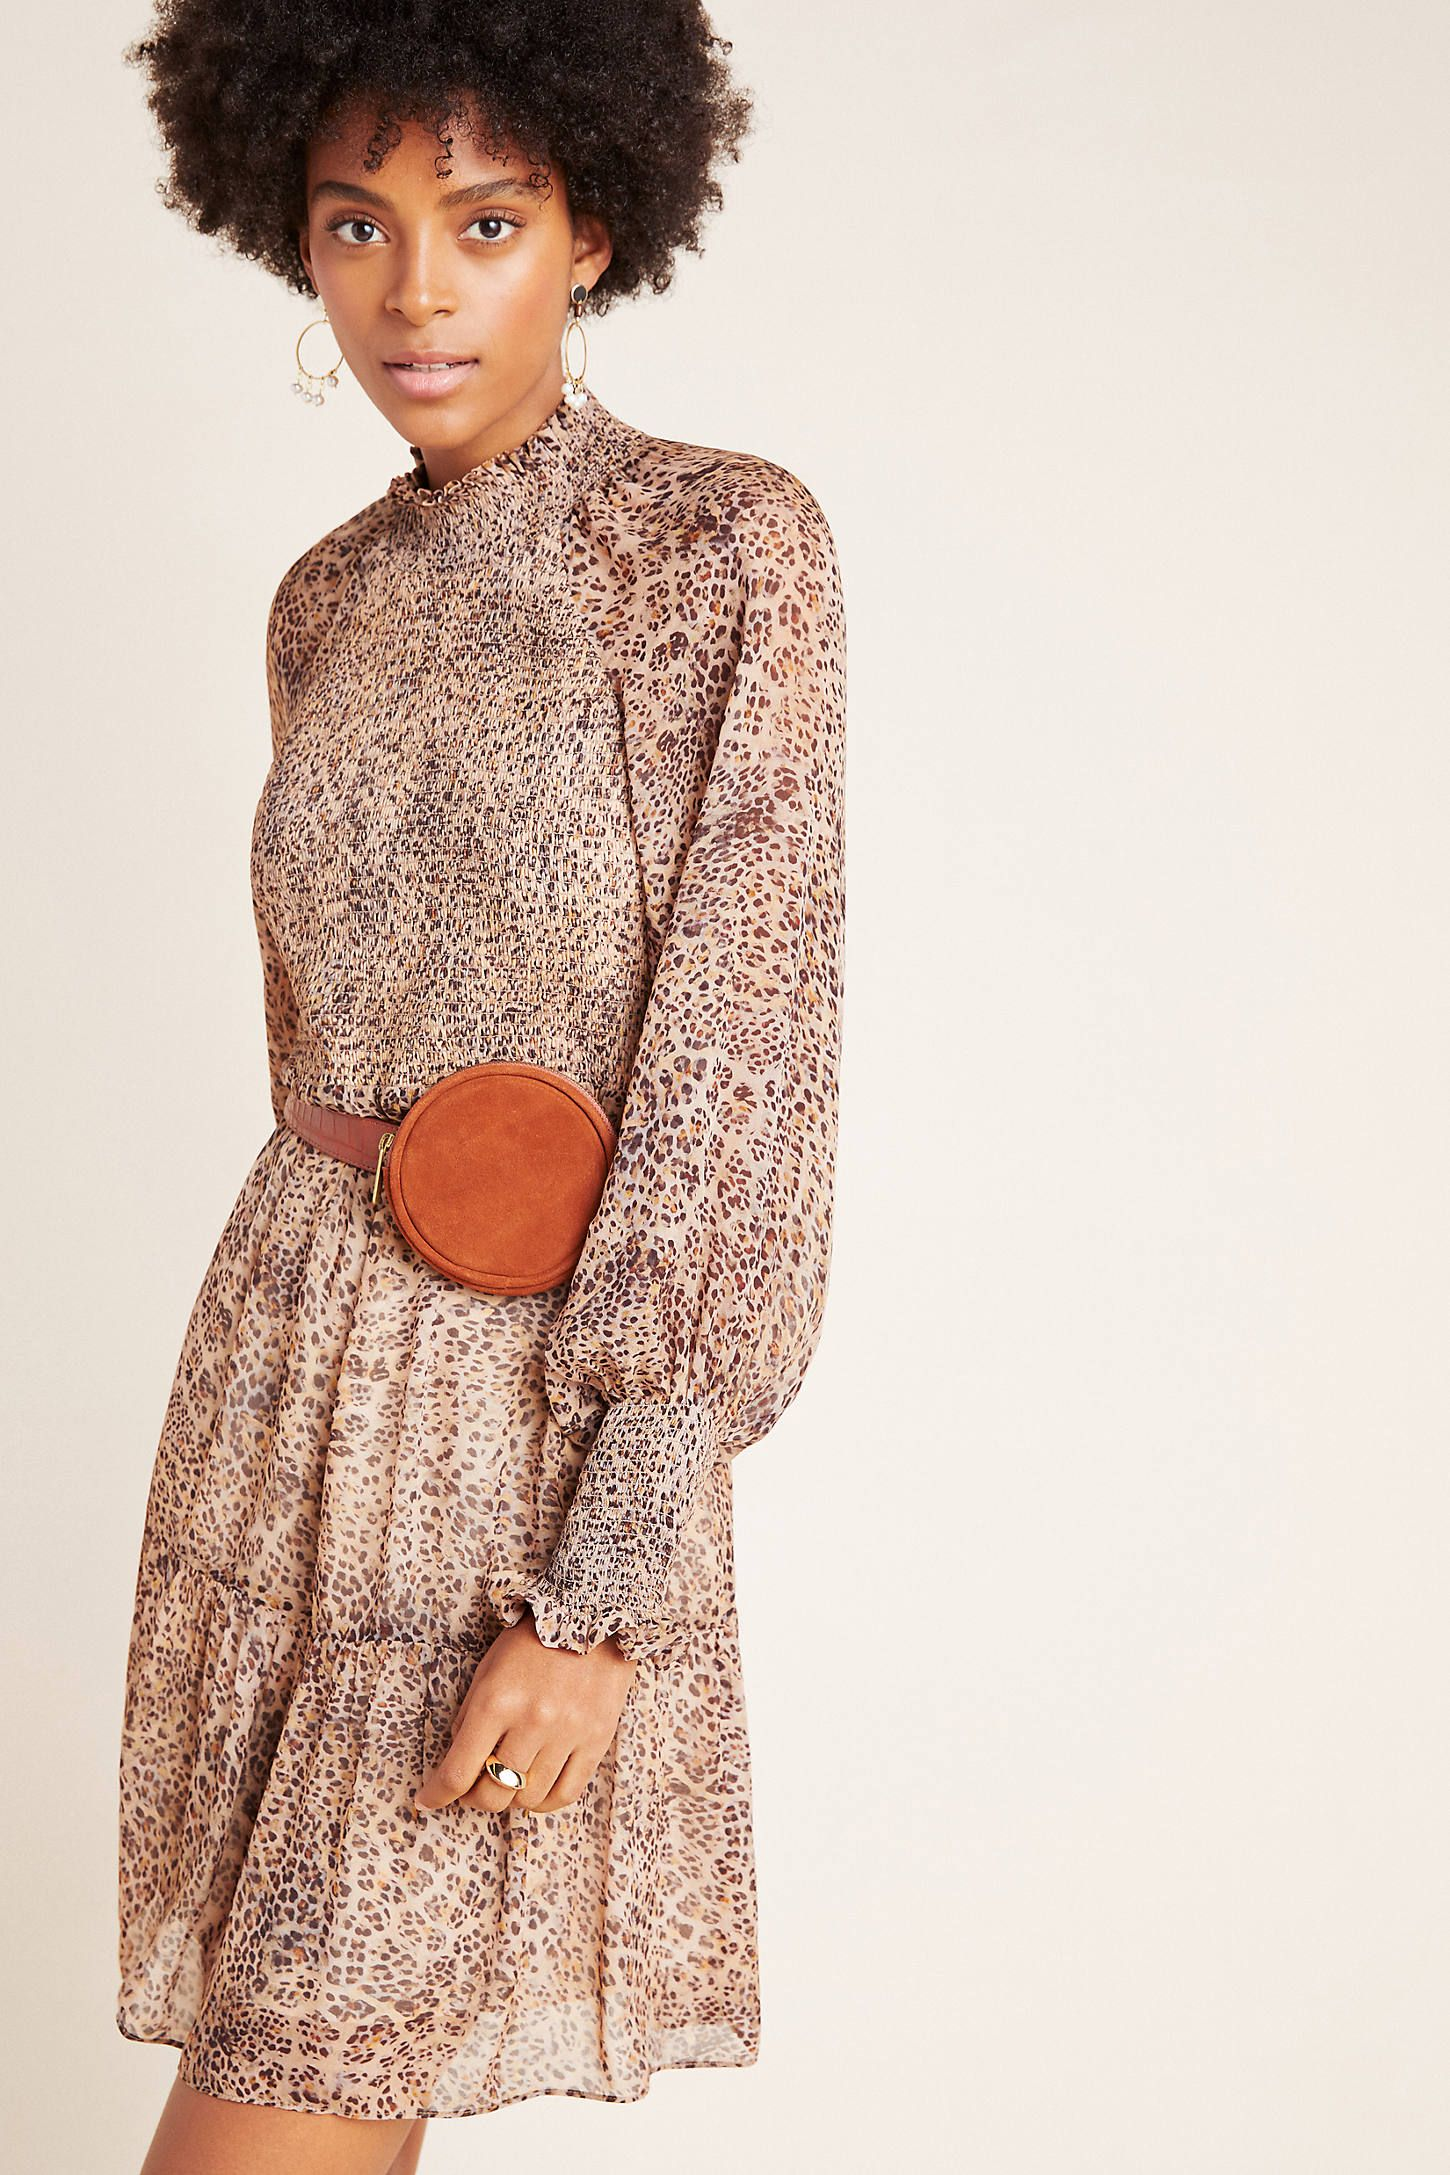 ML Monique Lhuillier Leopard Smocked Mini Dress 2